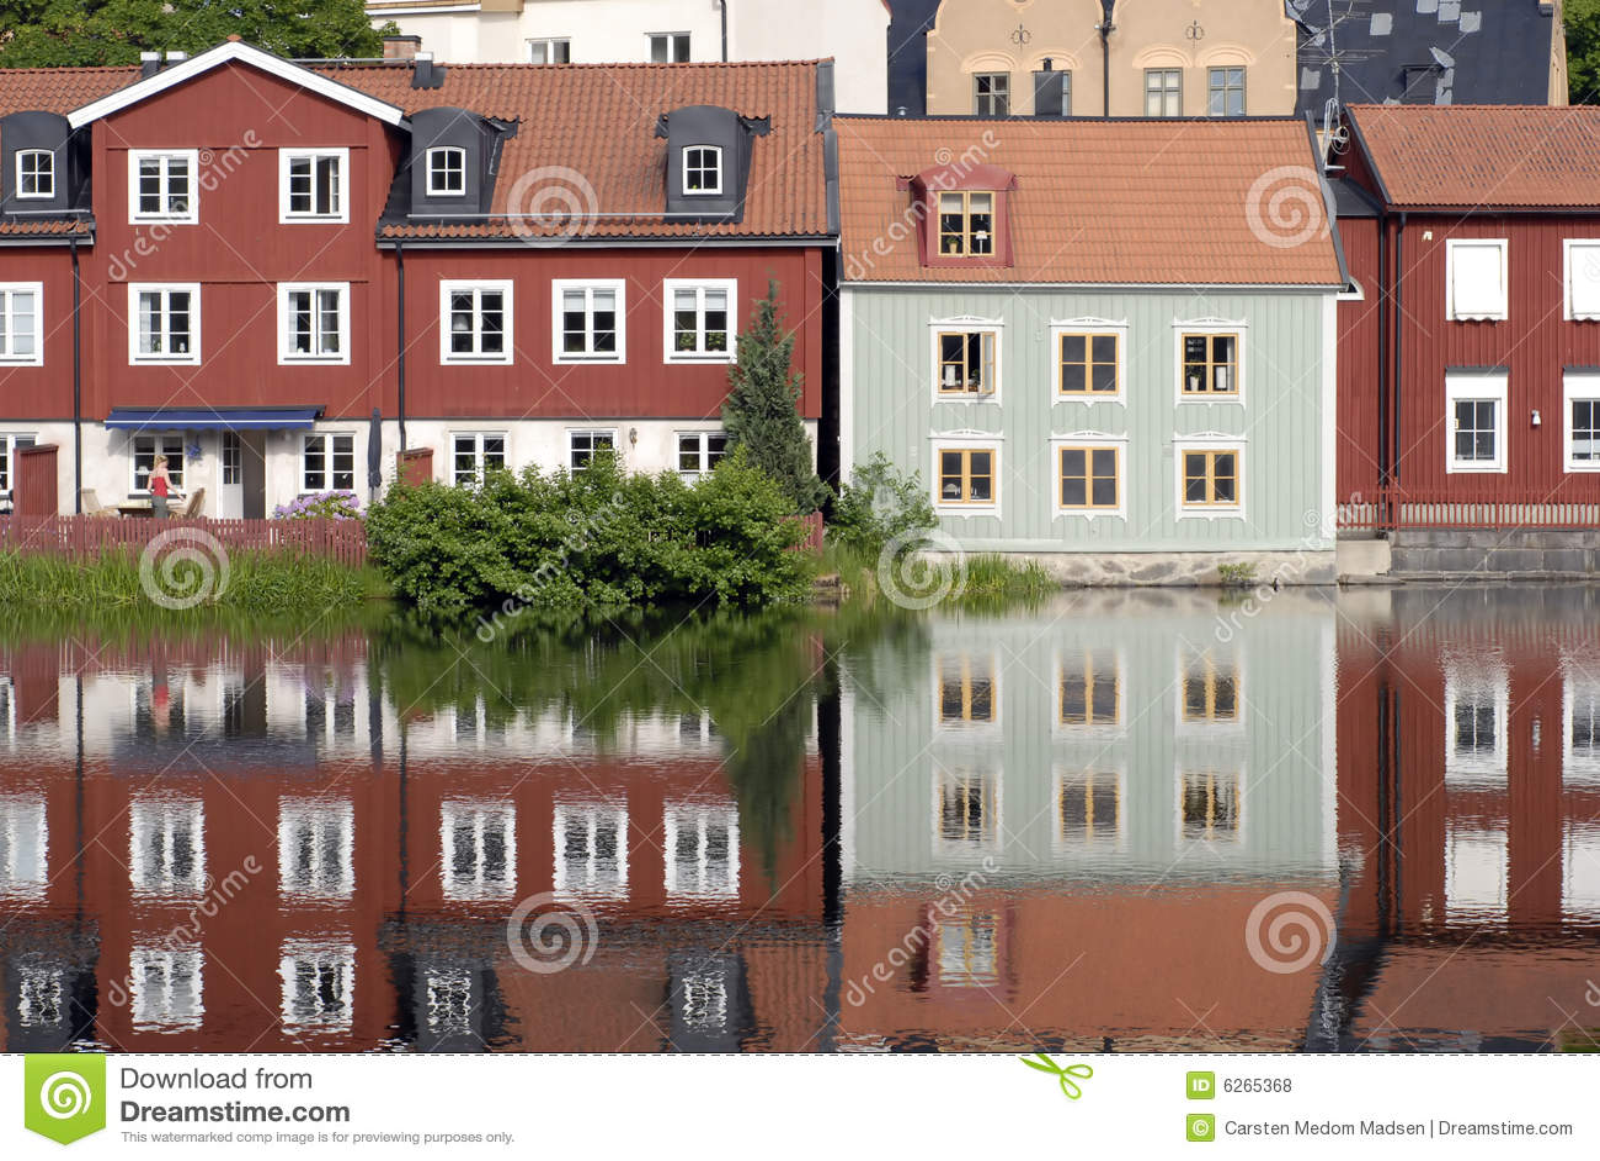 Casas escandinavas coloridas fotos de stock royalty free - Casas escandinavas ...